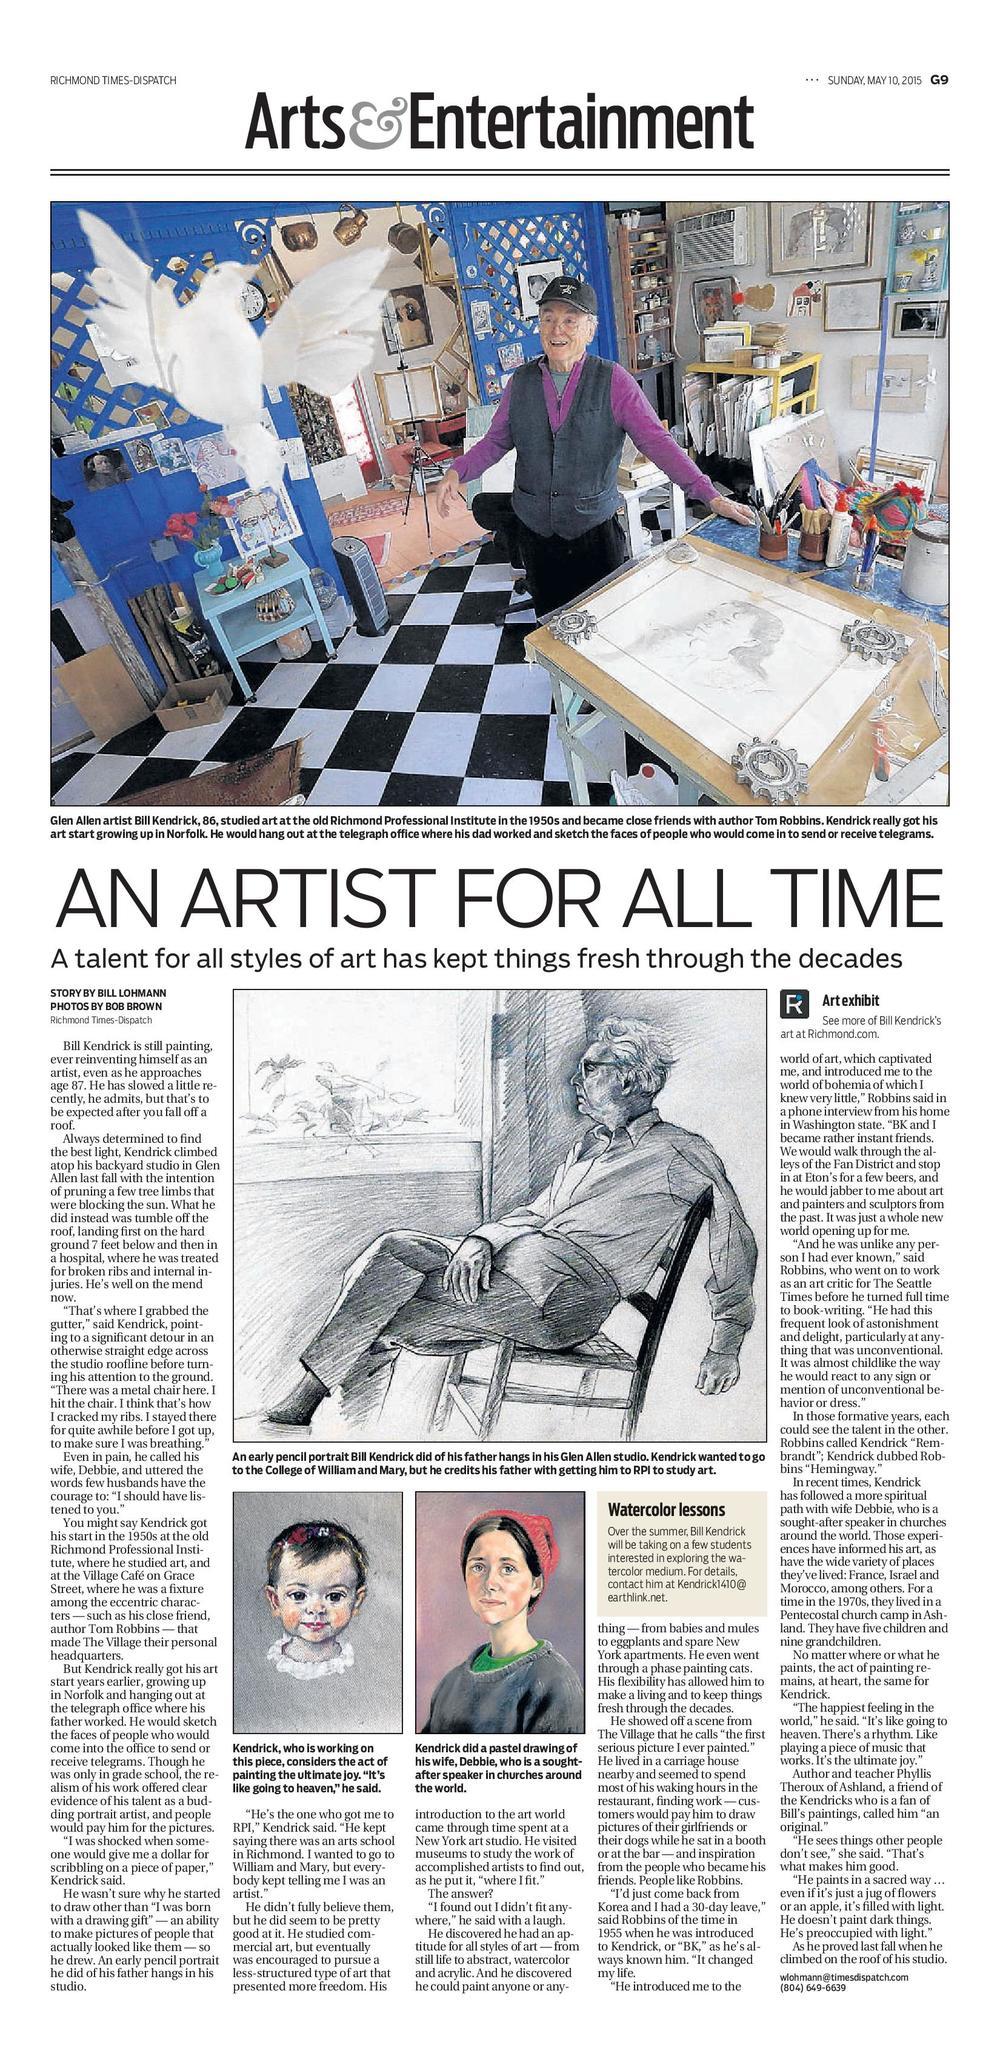 Richmond Times-Dispatch article